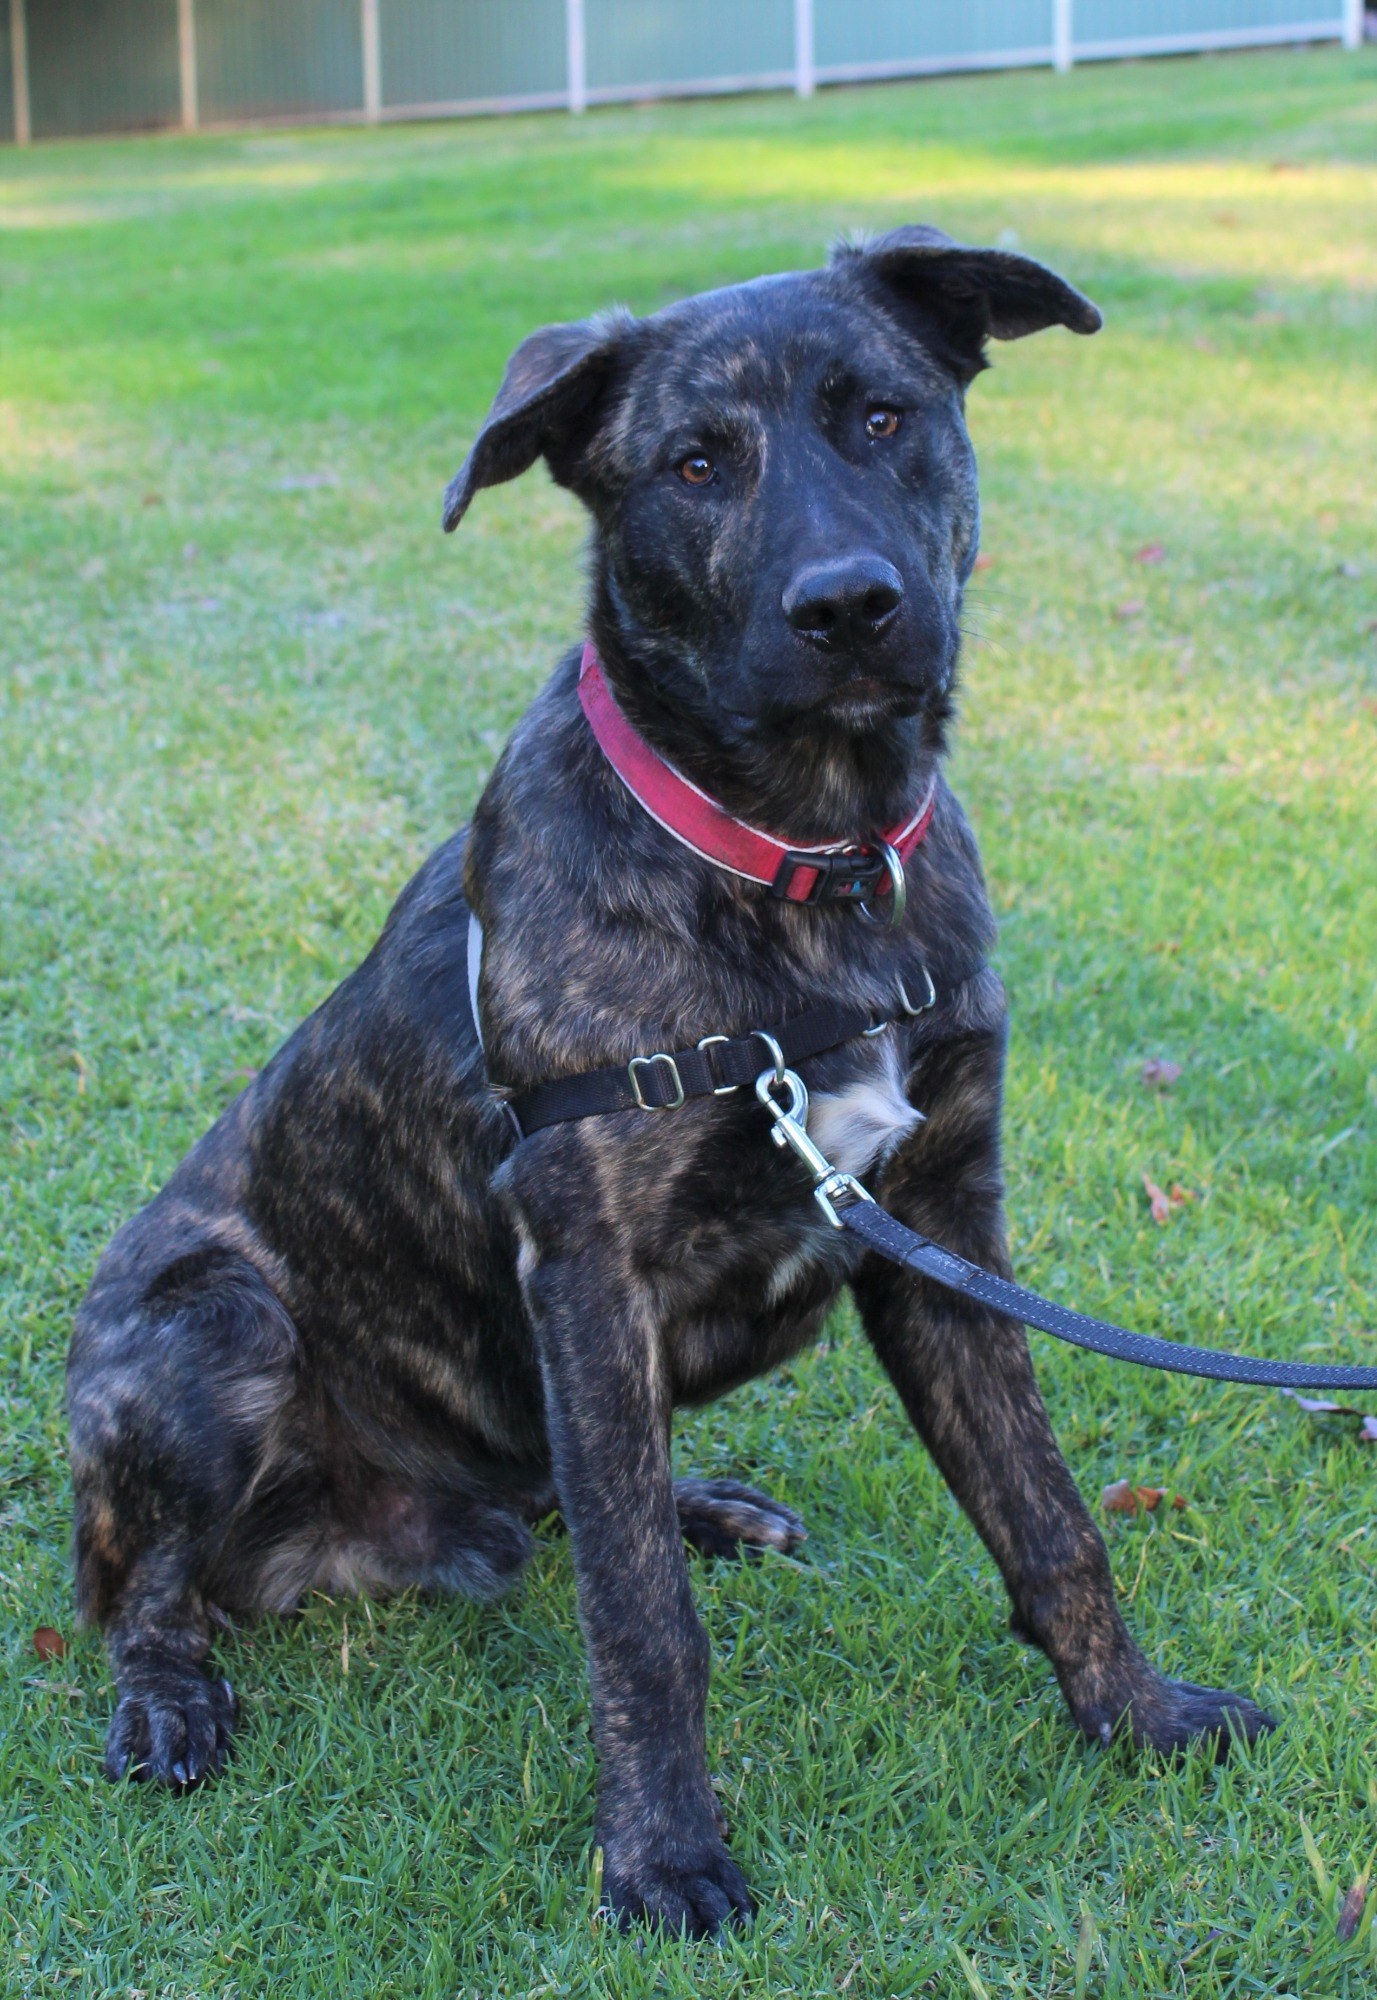 Dutch Shepherd Dog Breed Information - Shepherds Bone